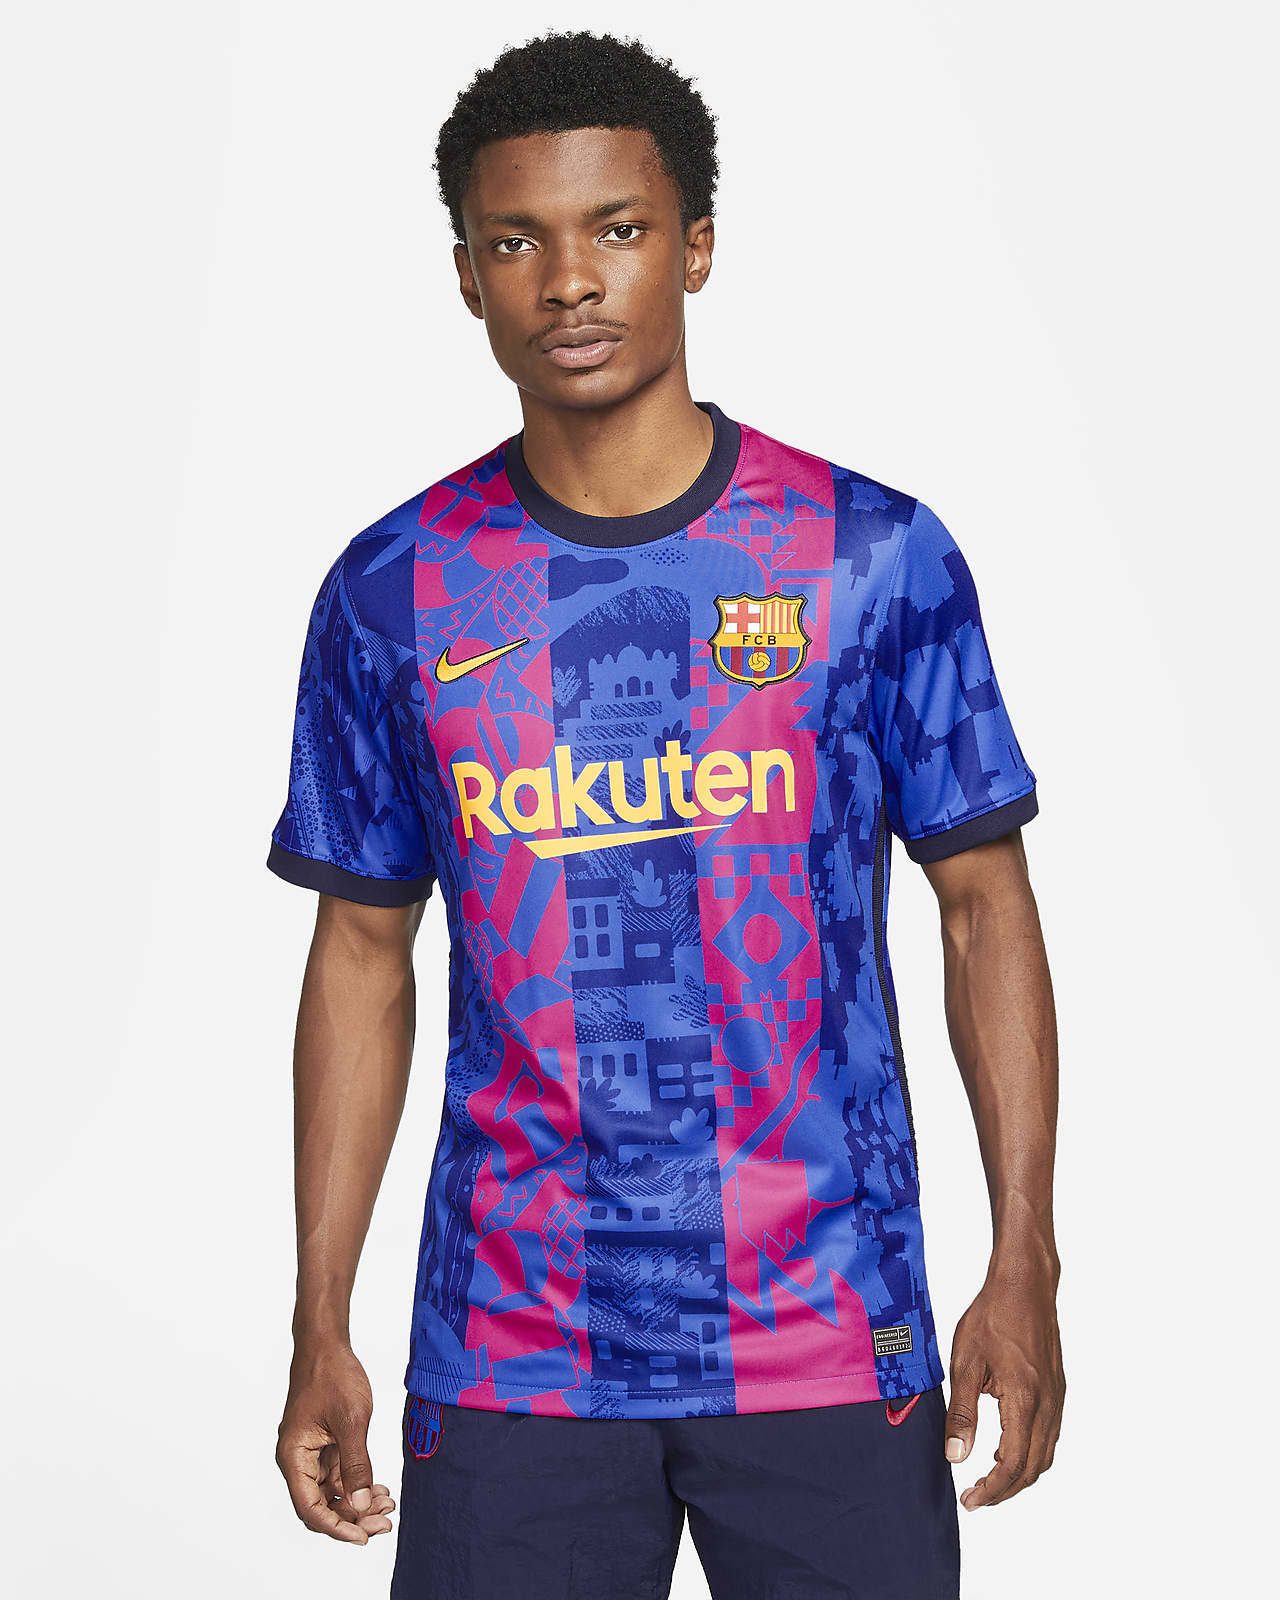 Jersey de fútbol Nike Dri-FIT FC Barcelona alternativo 2021/22 Stadium para hombre